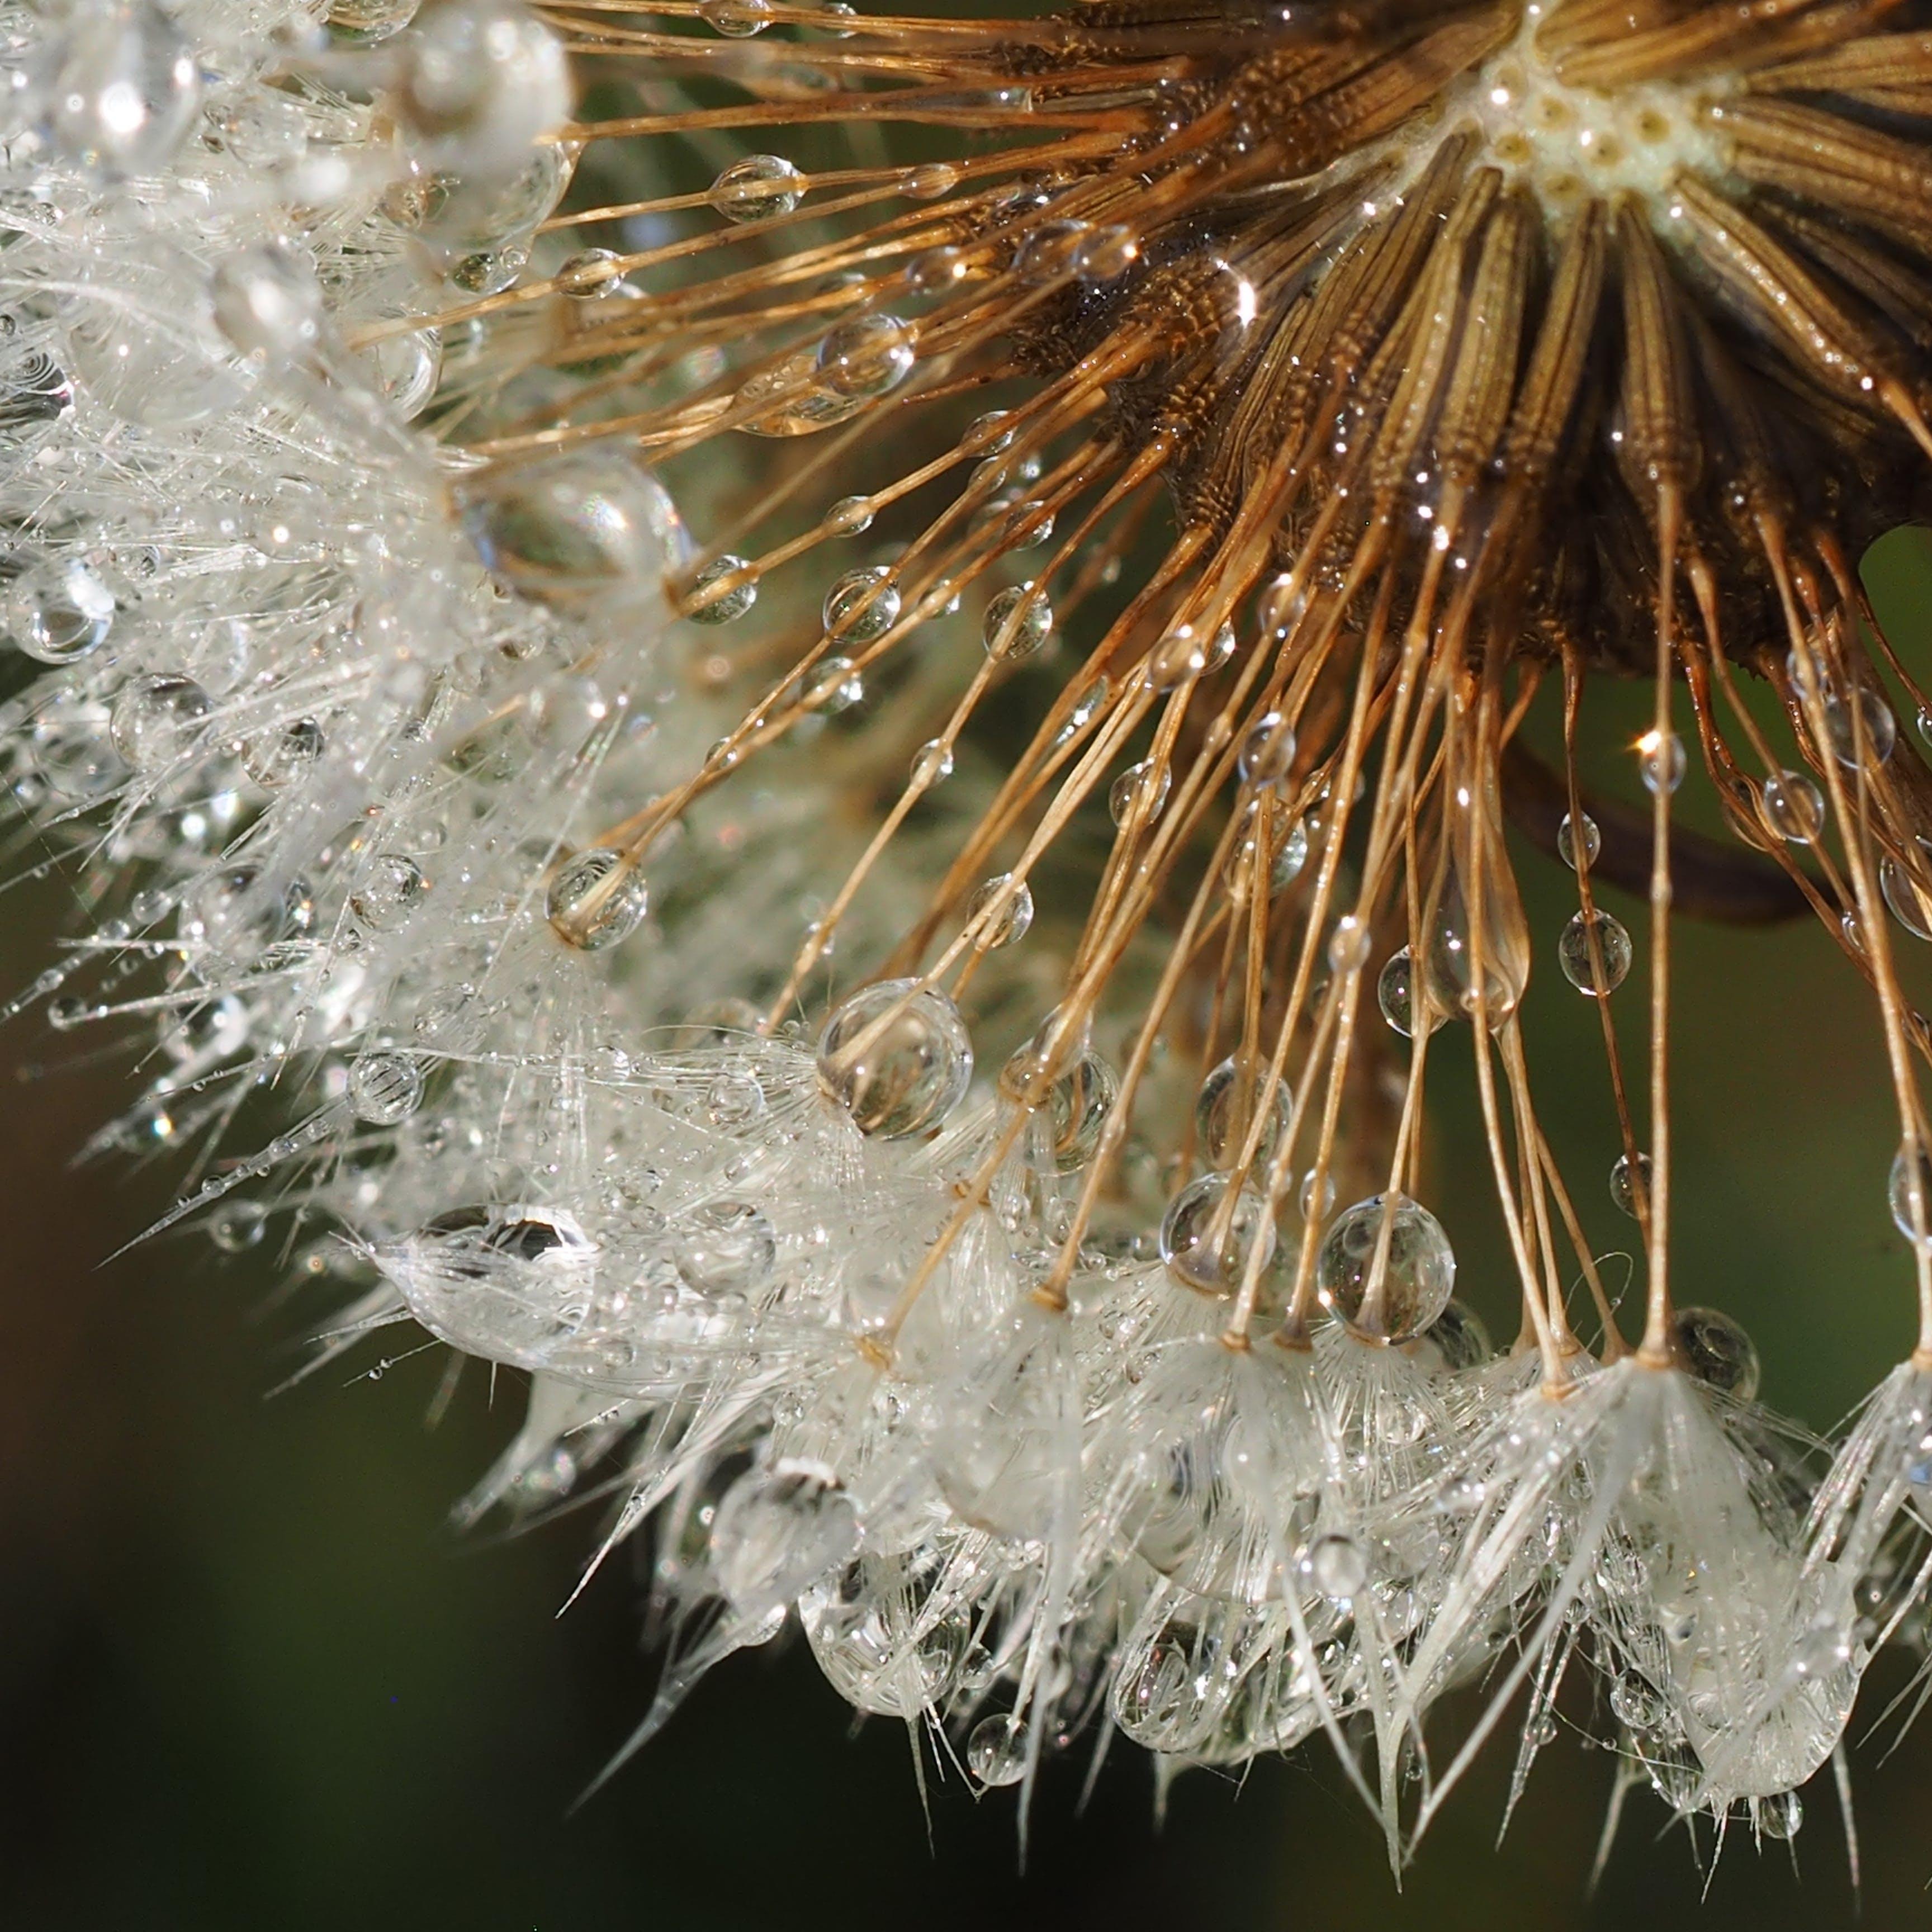 Free stock photo of nature, dew, wet, dandelion